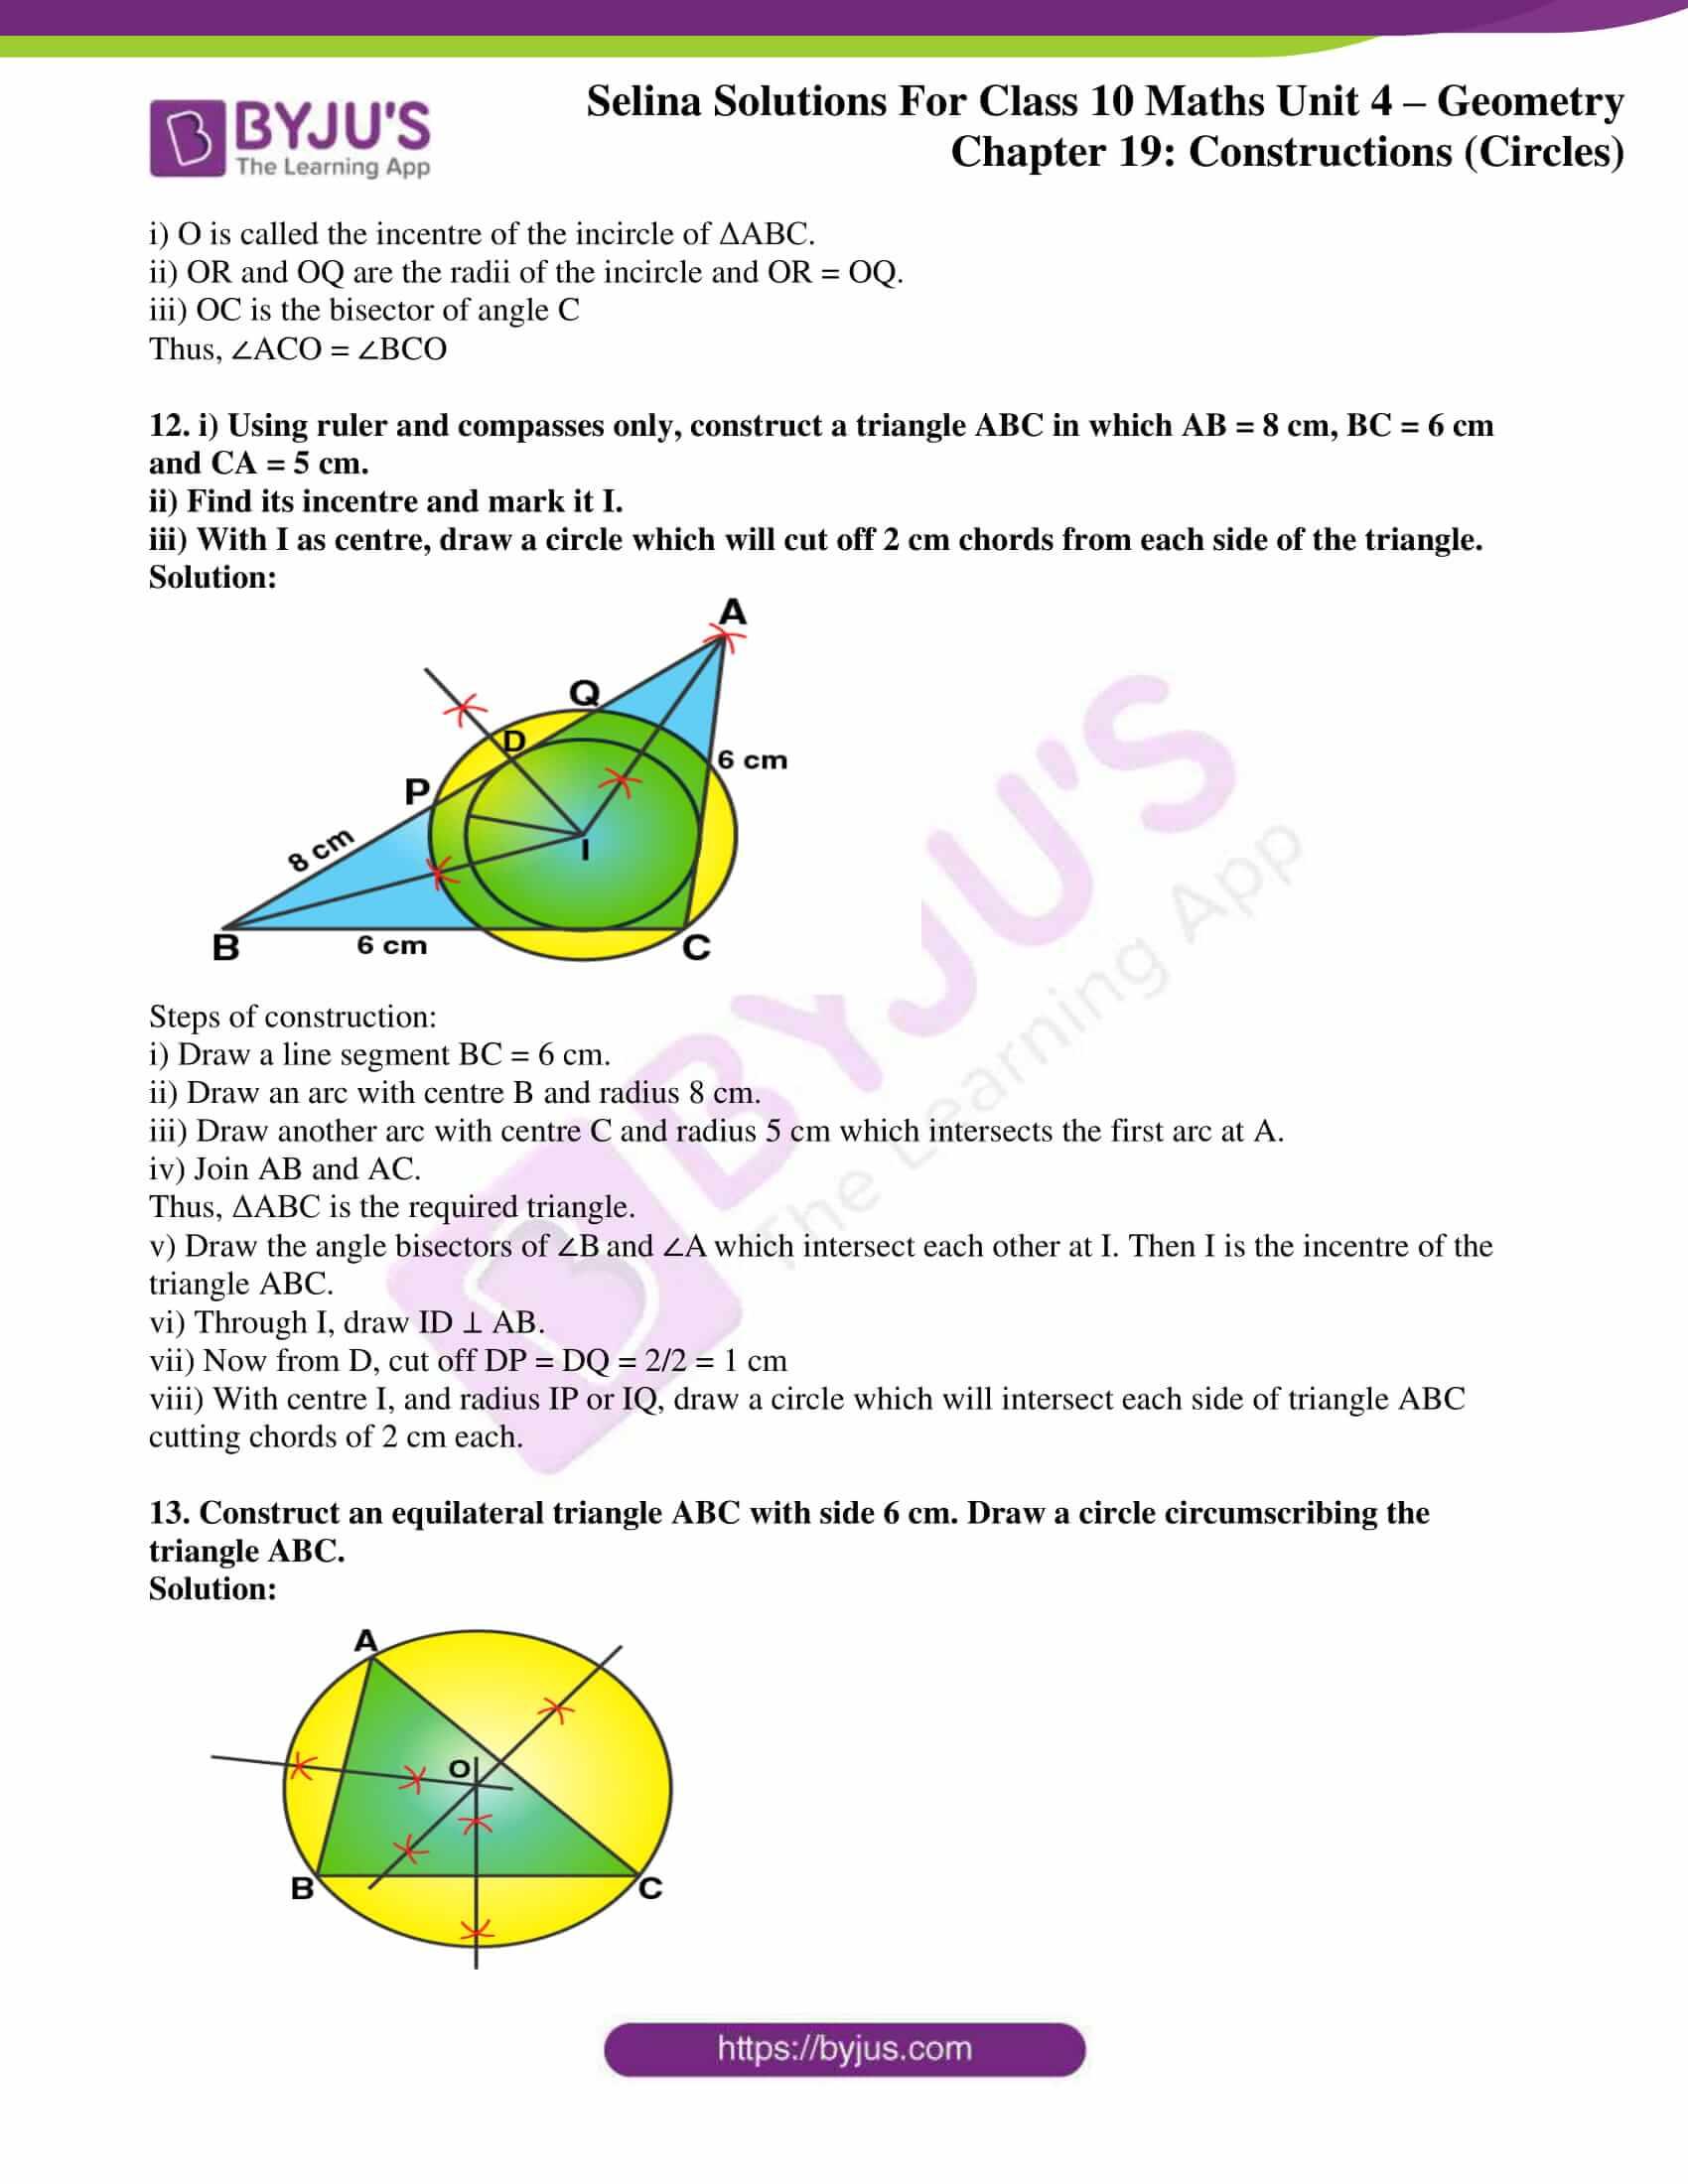 selina-sol-maths-class-10-ch-19-7